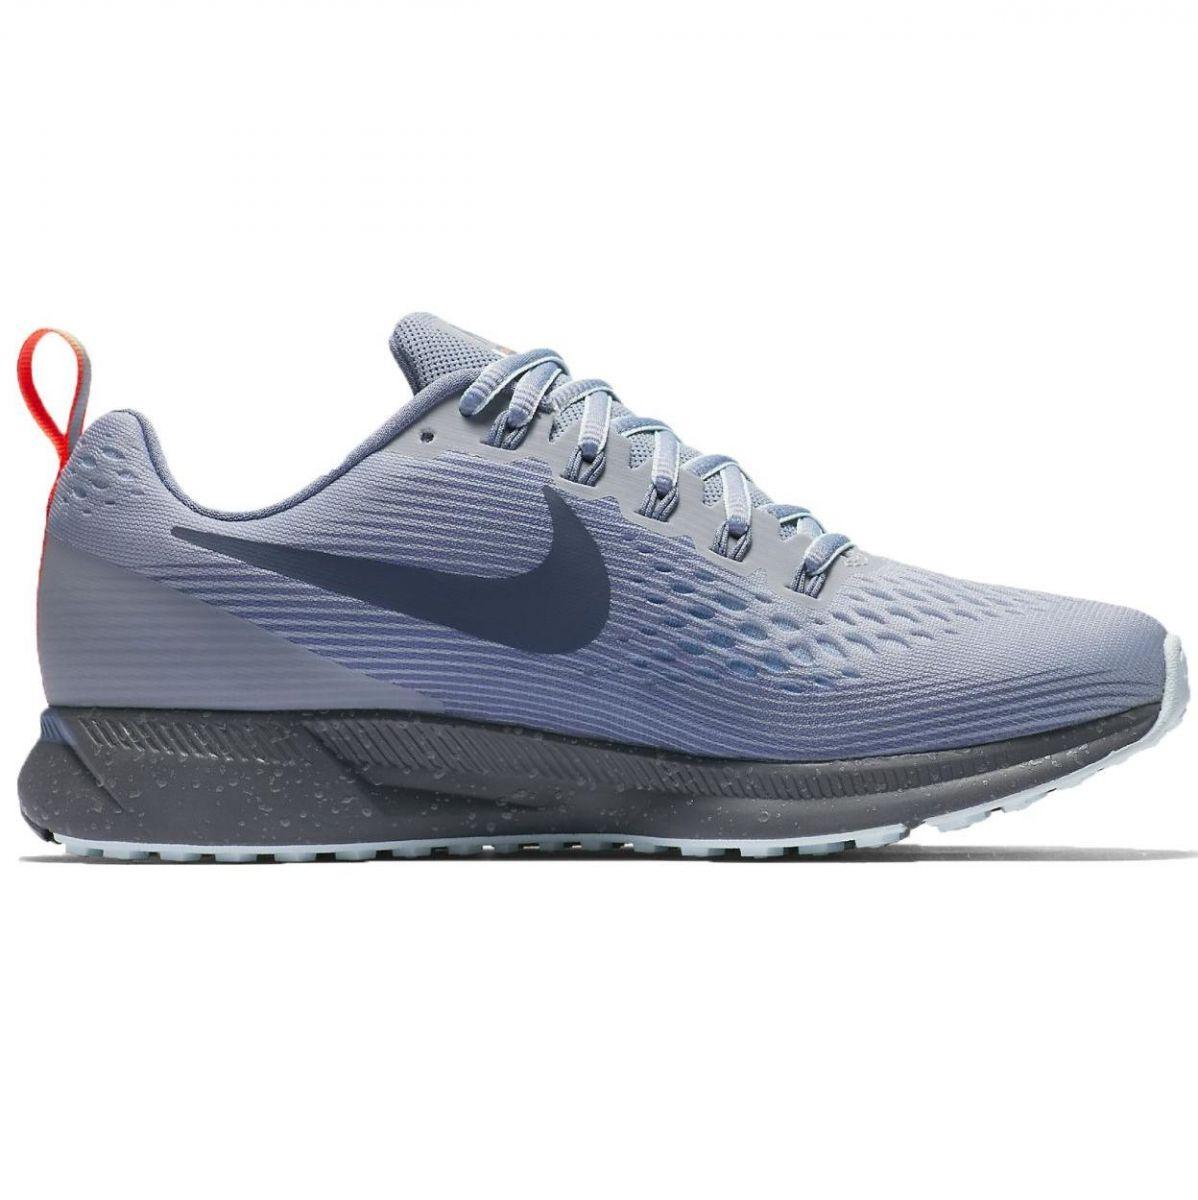 timeless design fe57c c3caf Nike Air Zoom Pegasus 34 Shield Damen Laufschuhe Running grau